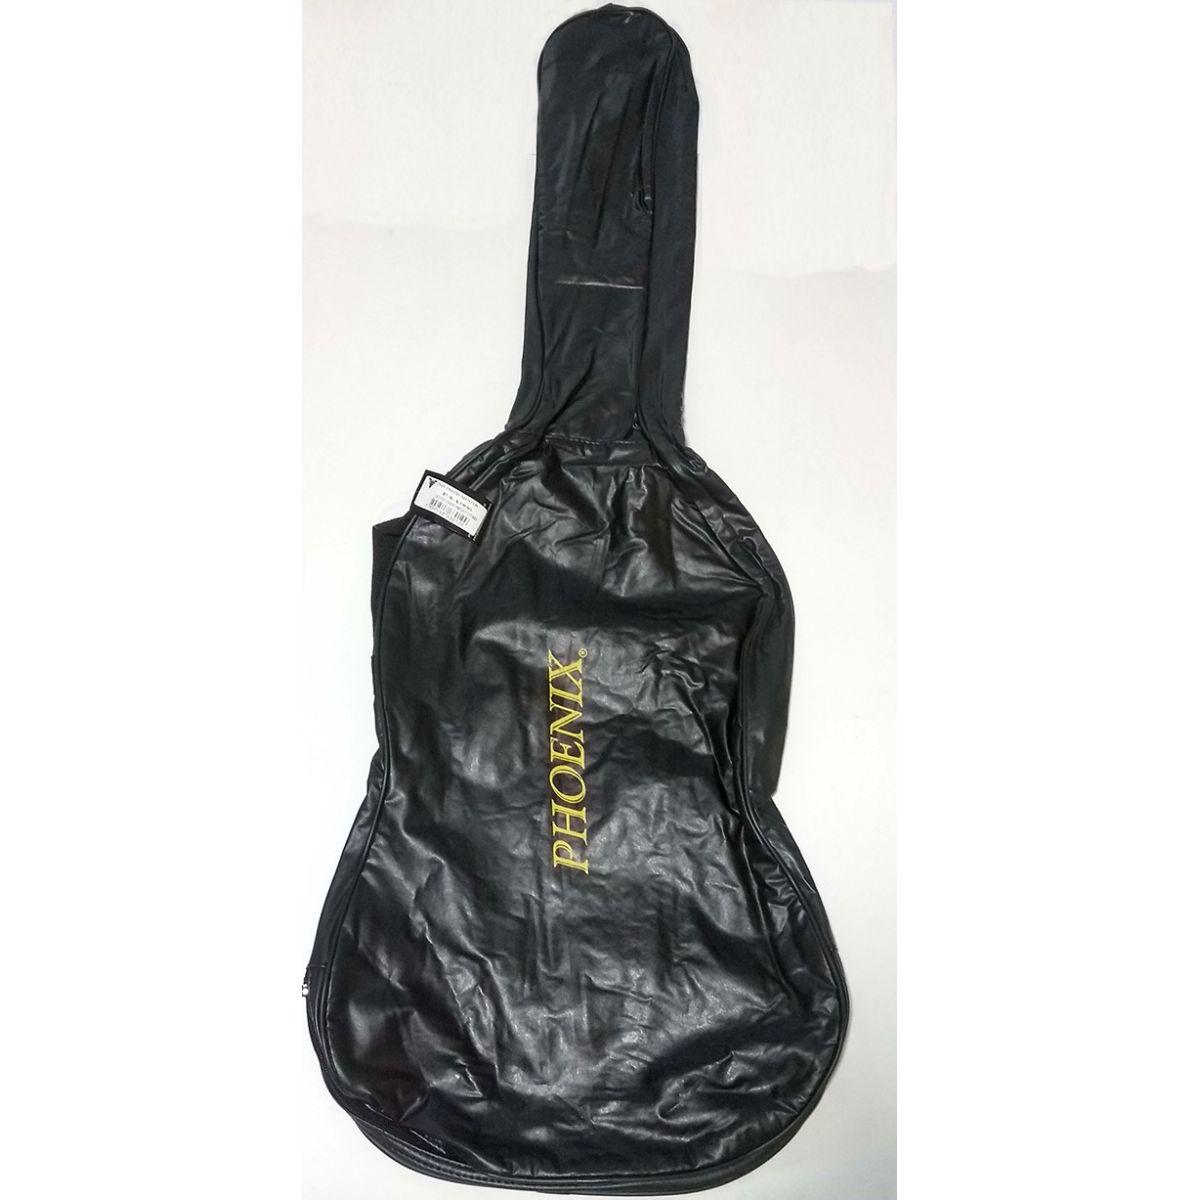 Capa PHX Guitarra Courino Simples